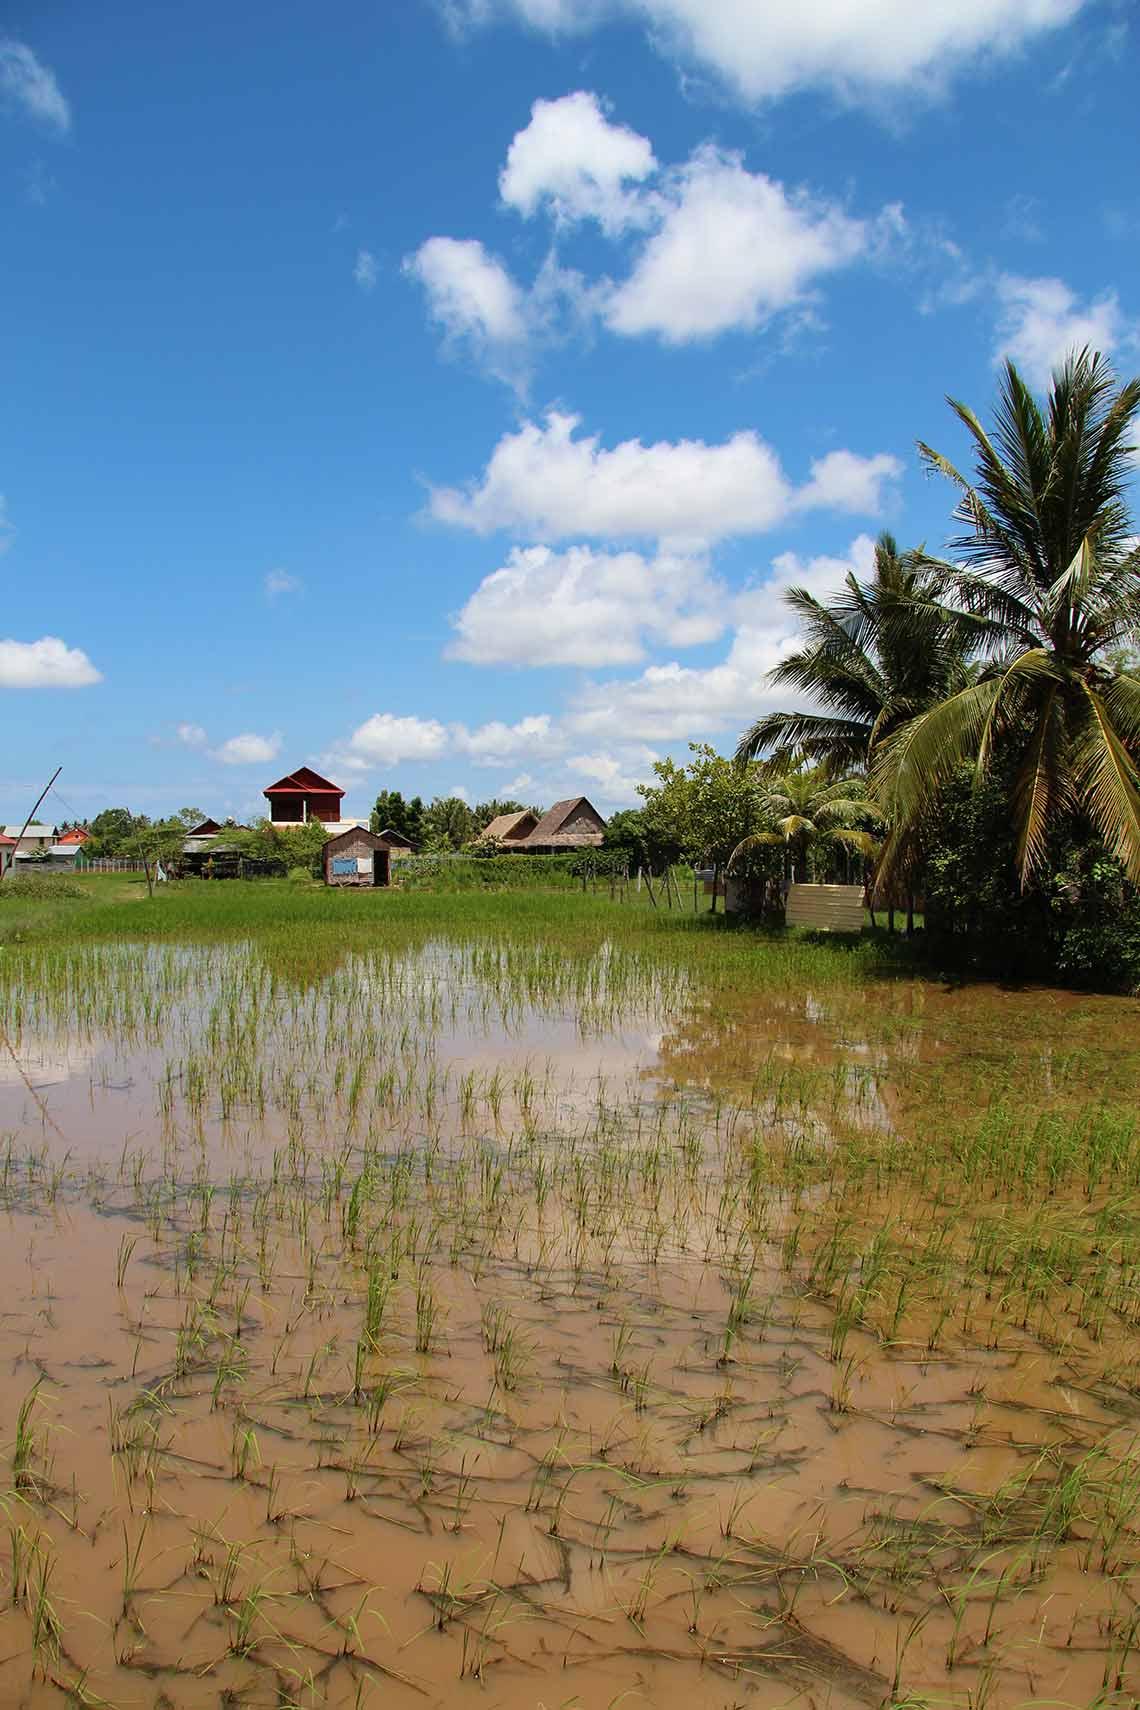 Reisfeld - Siem Reap